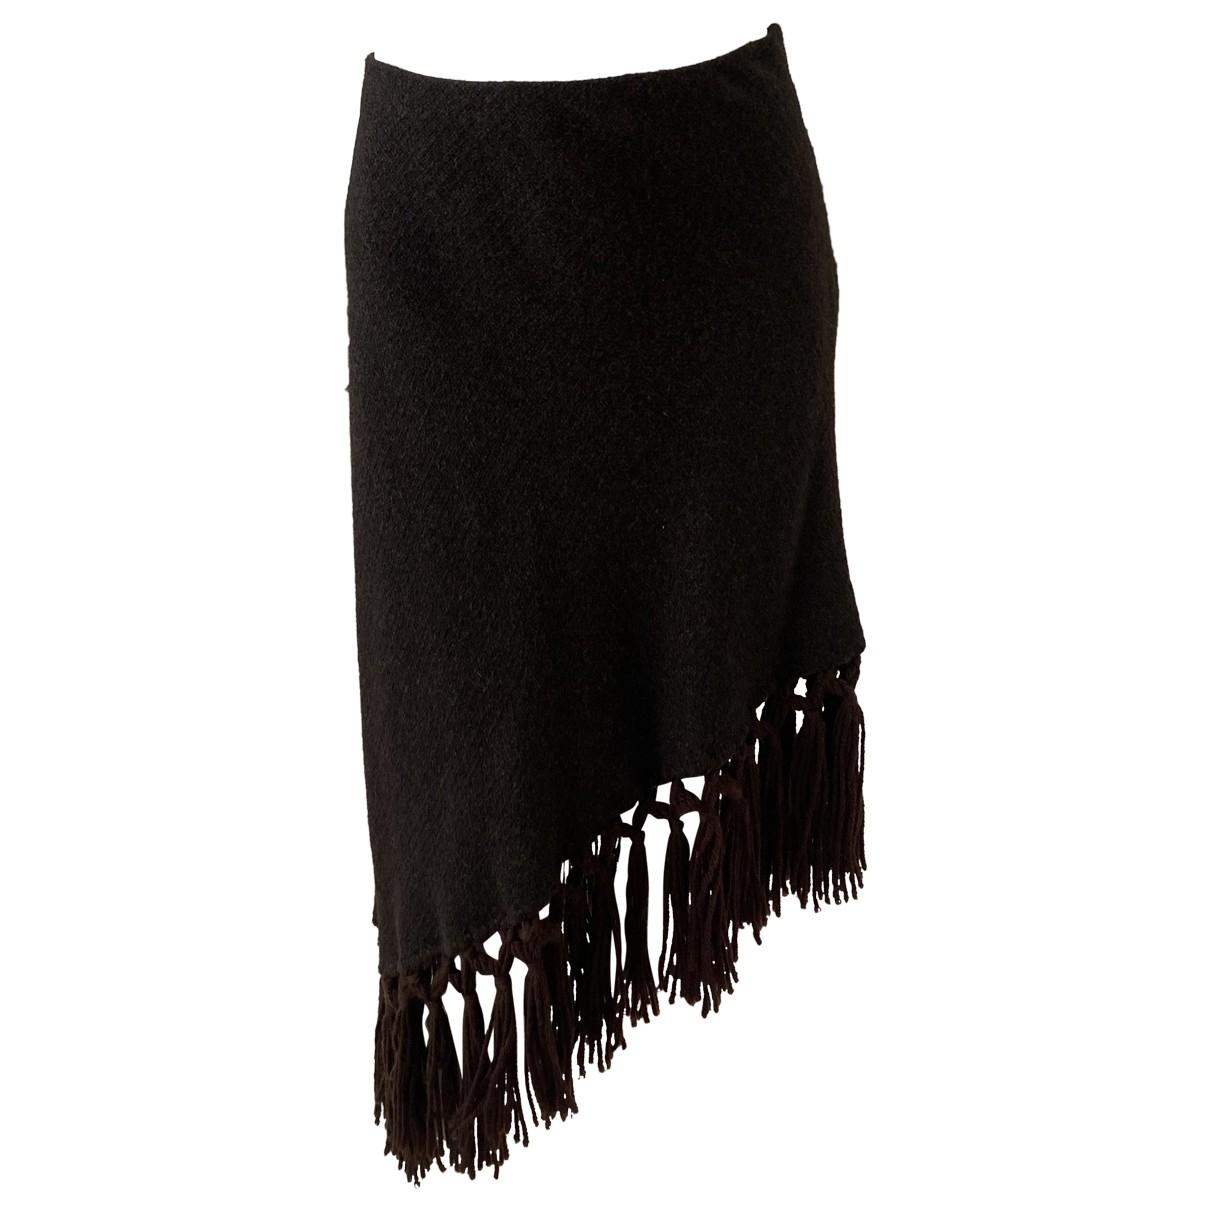 Dolce & Gabbana \N Brown skirt for Women 40 IT